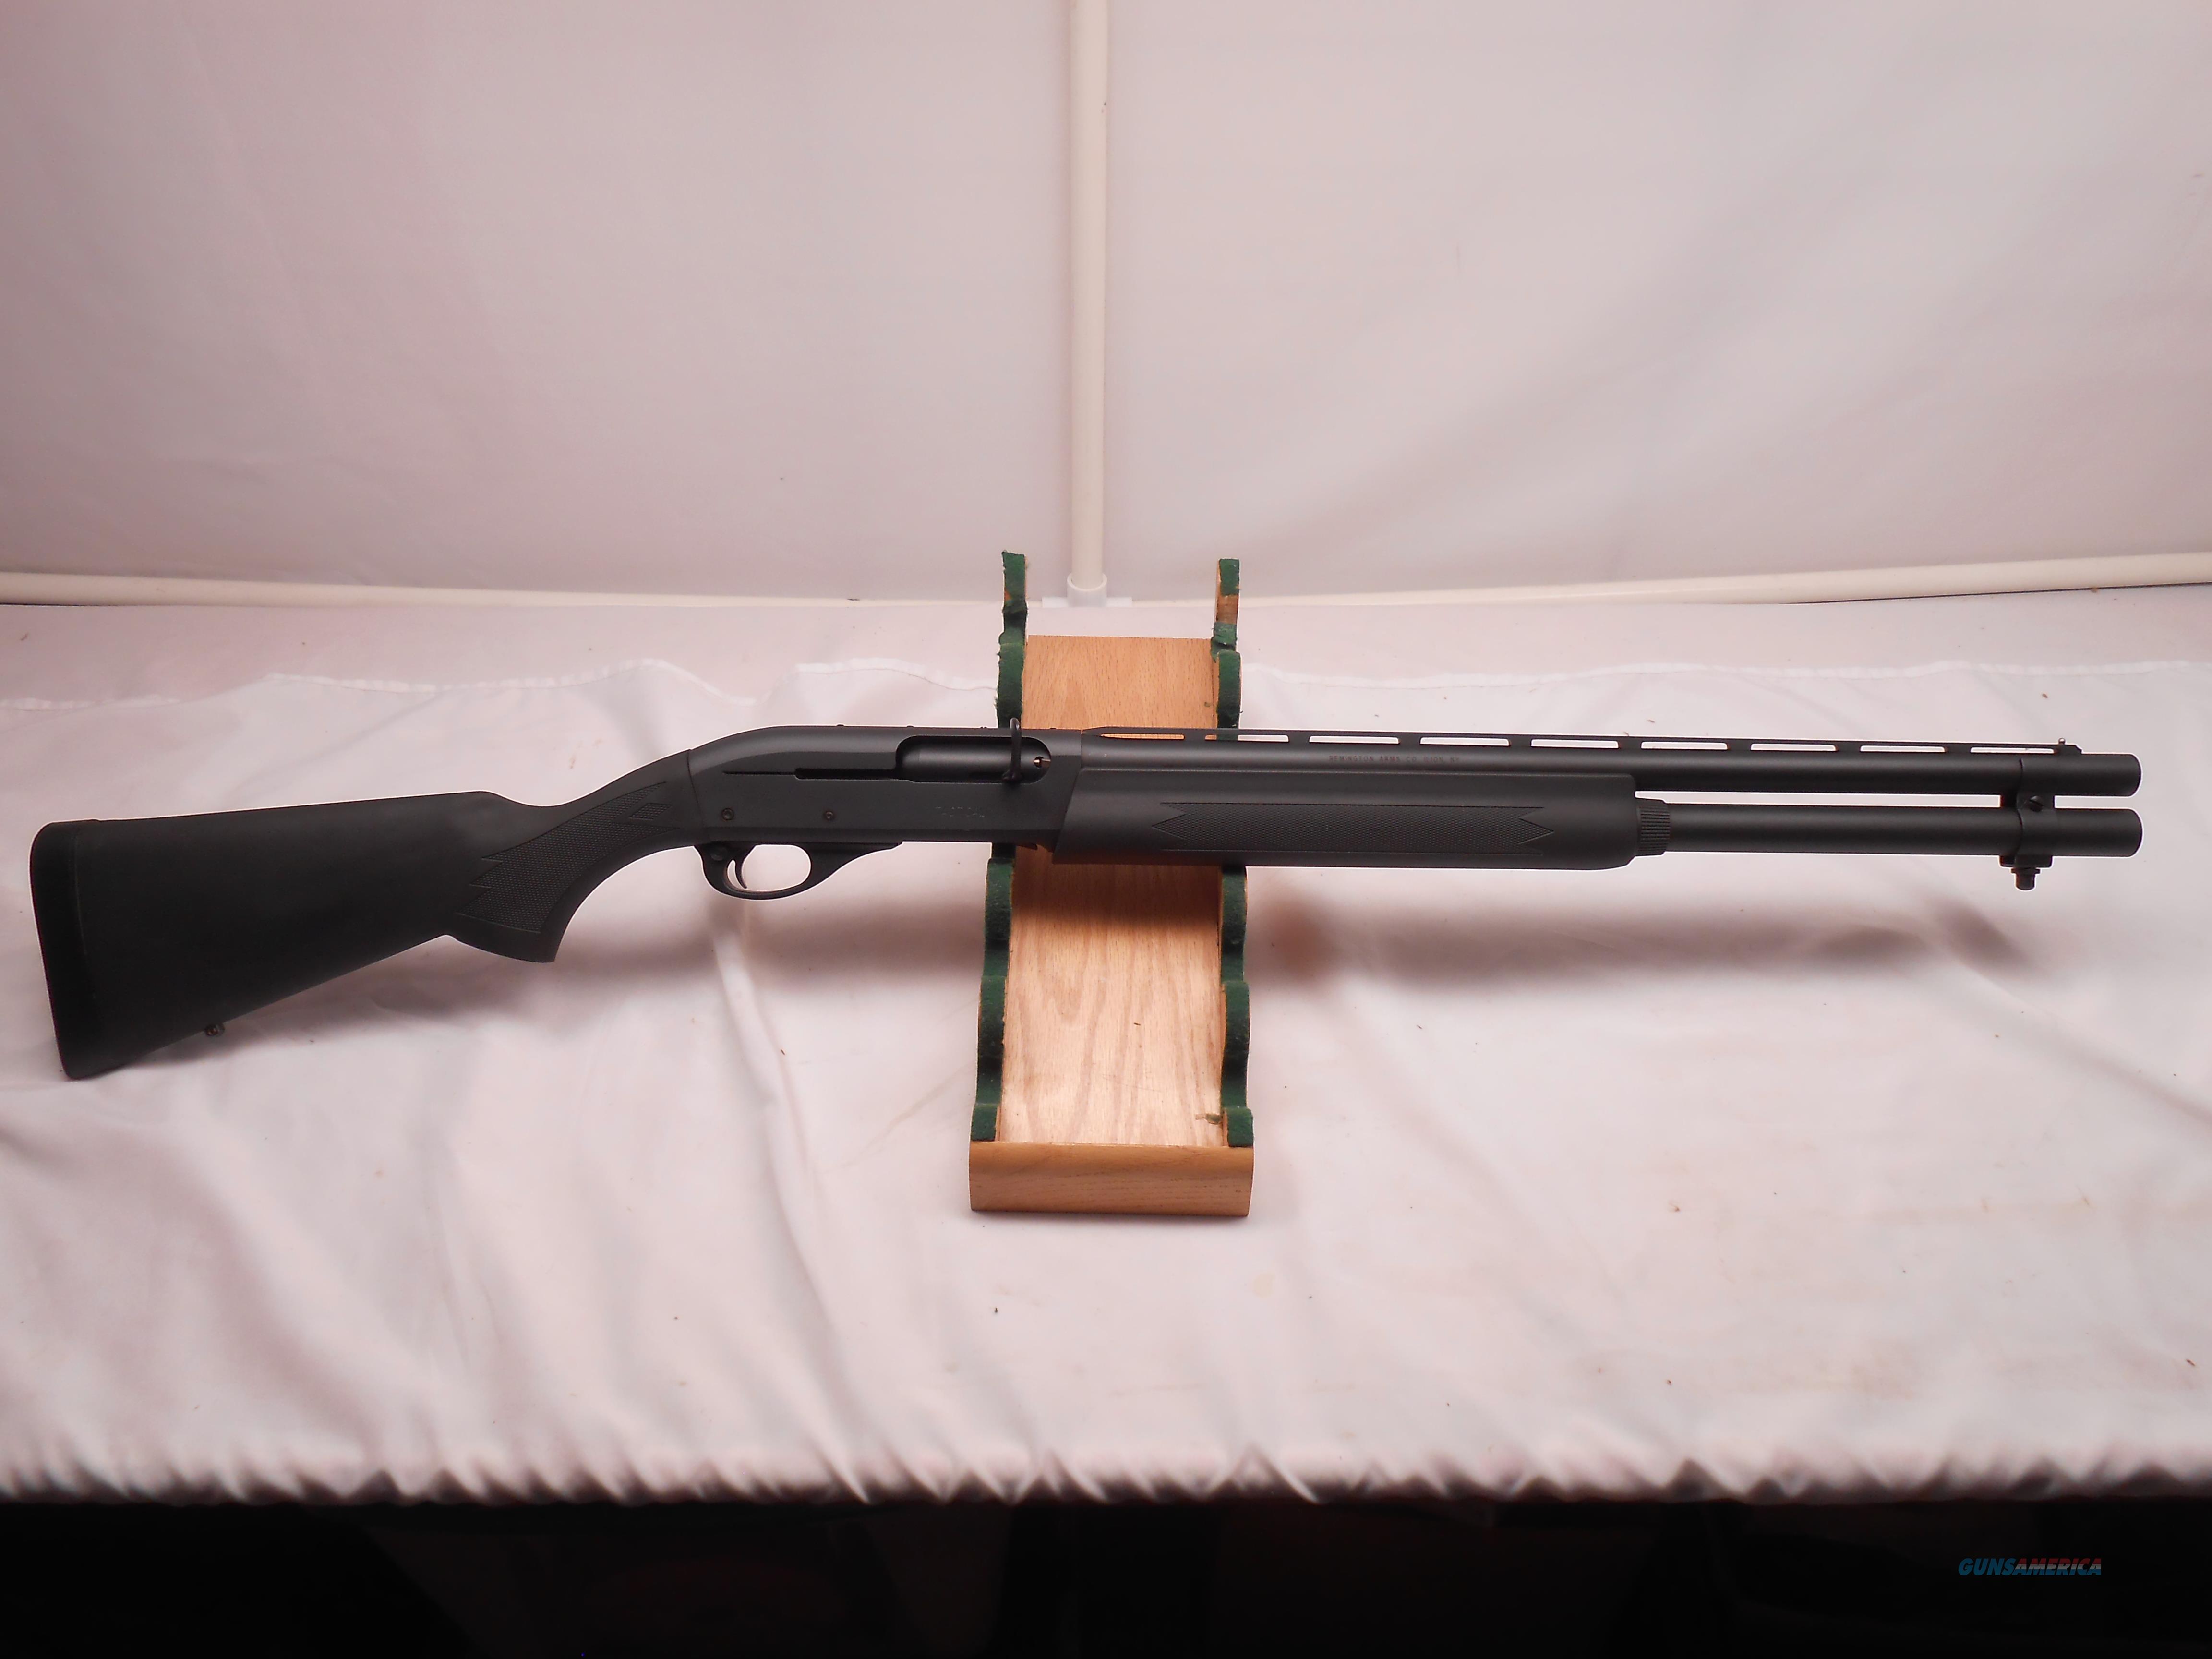 Remington 1100 Tactical 12ga 2 3/4  Guns > Shotguns > Remington Shotguns  > Autoloaders > Tactical